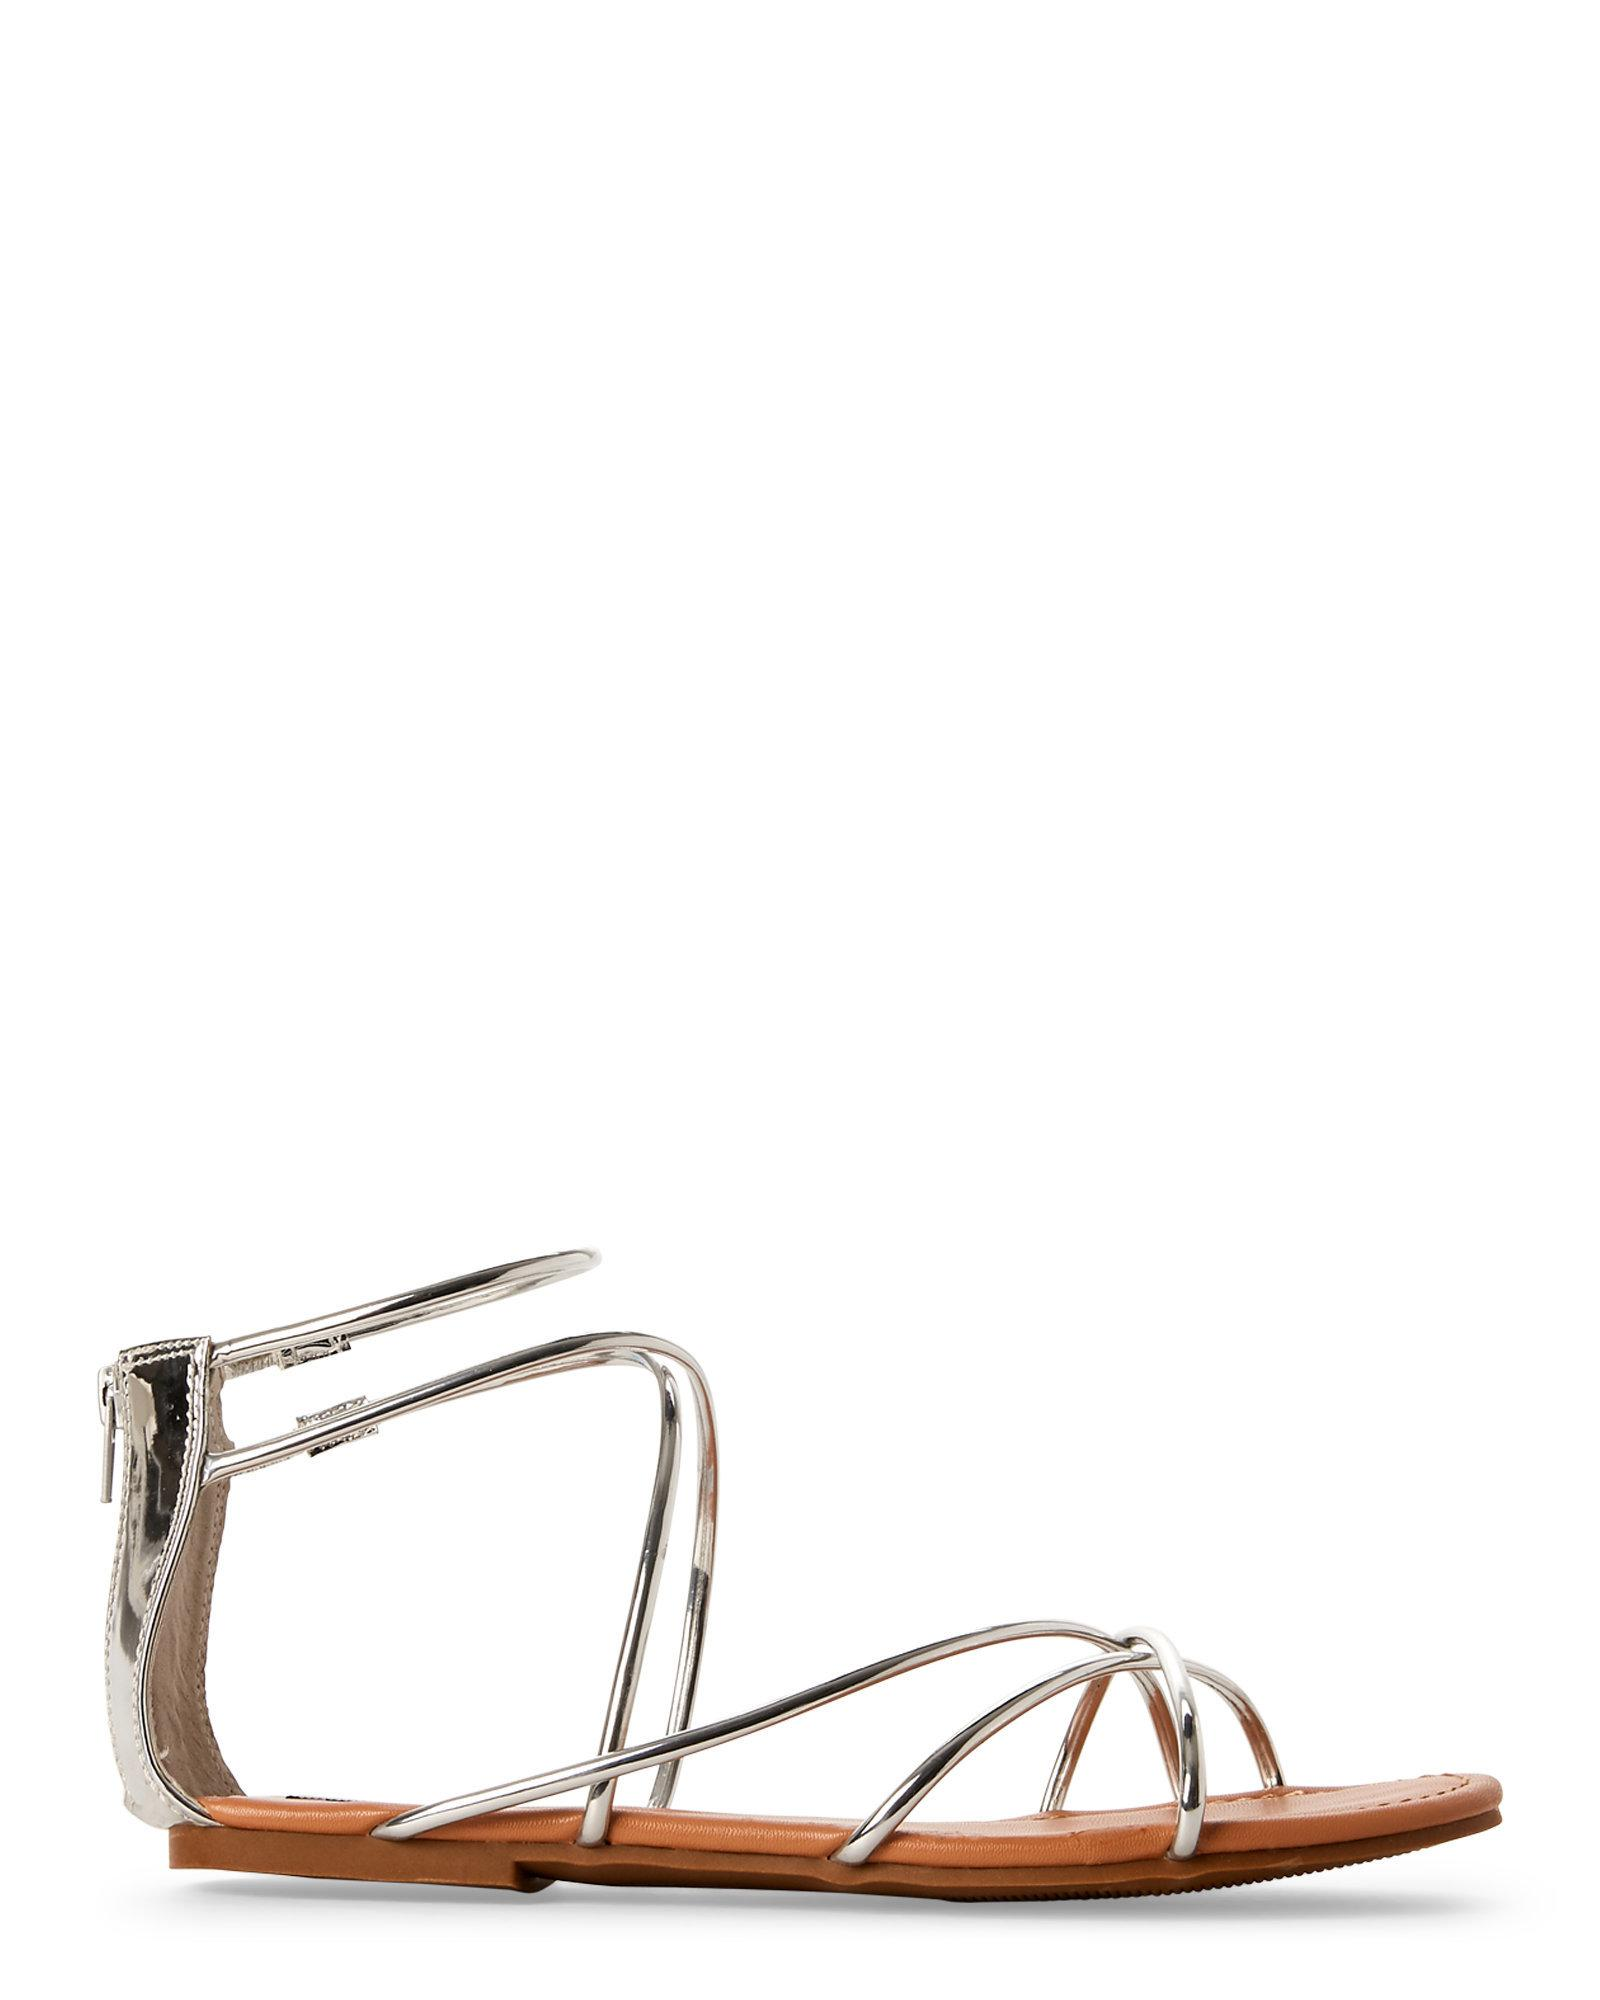 09a9fcca6fd Steve Madden Metallic Silver Sapphire Strappy Flat Sandals